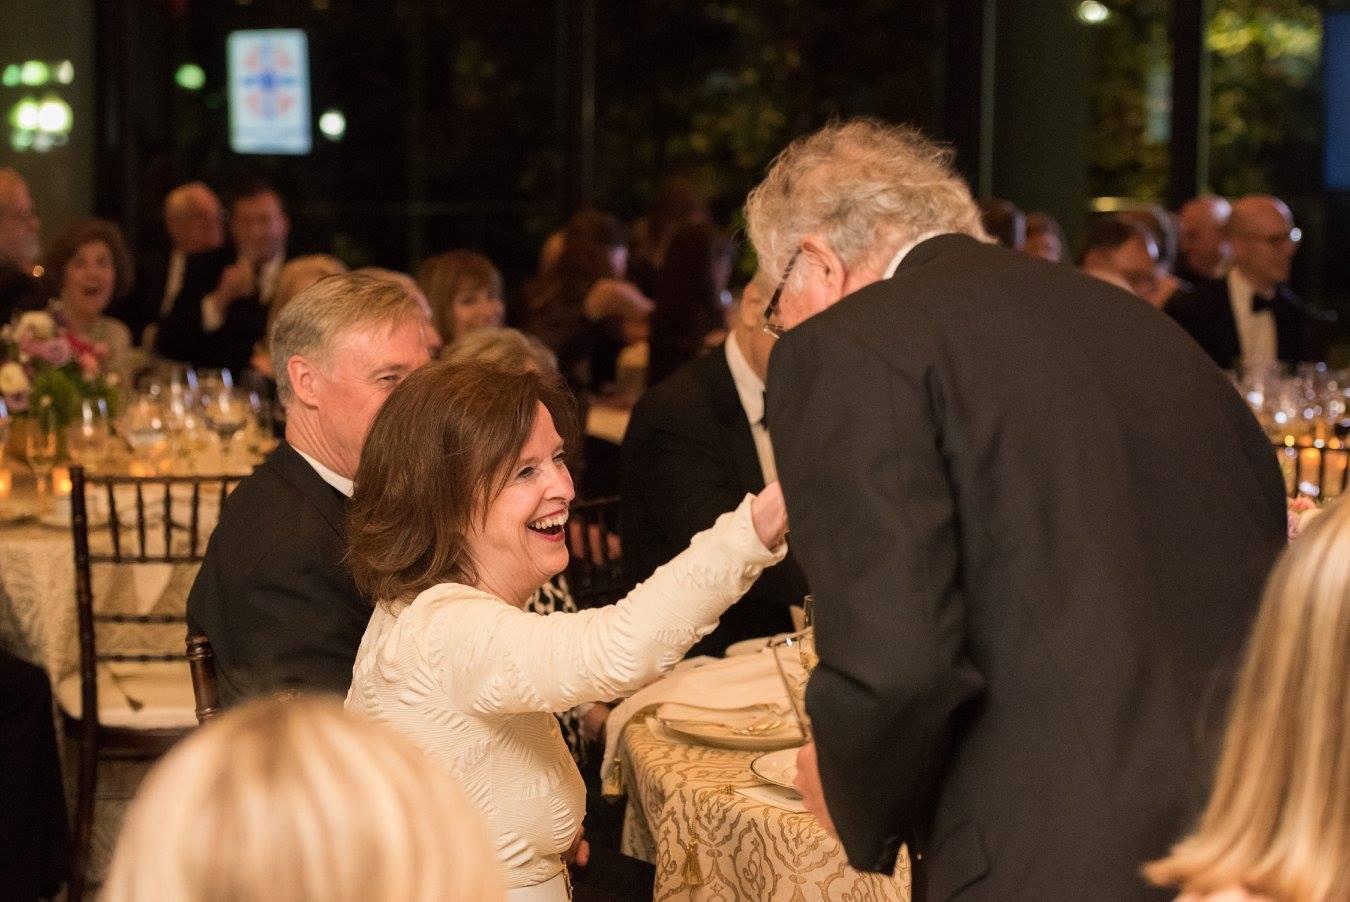 Mr. John N. Lauer gives Ambassador April H. Foley a hand-kiss